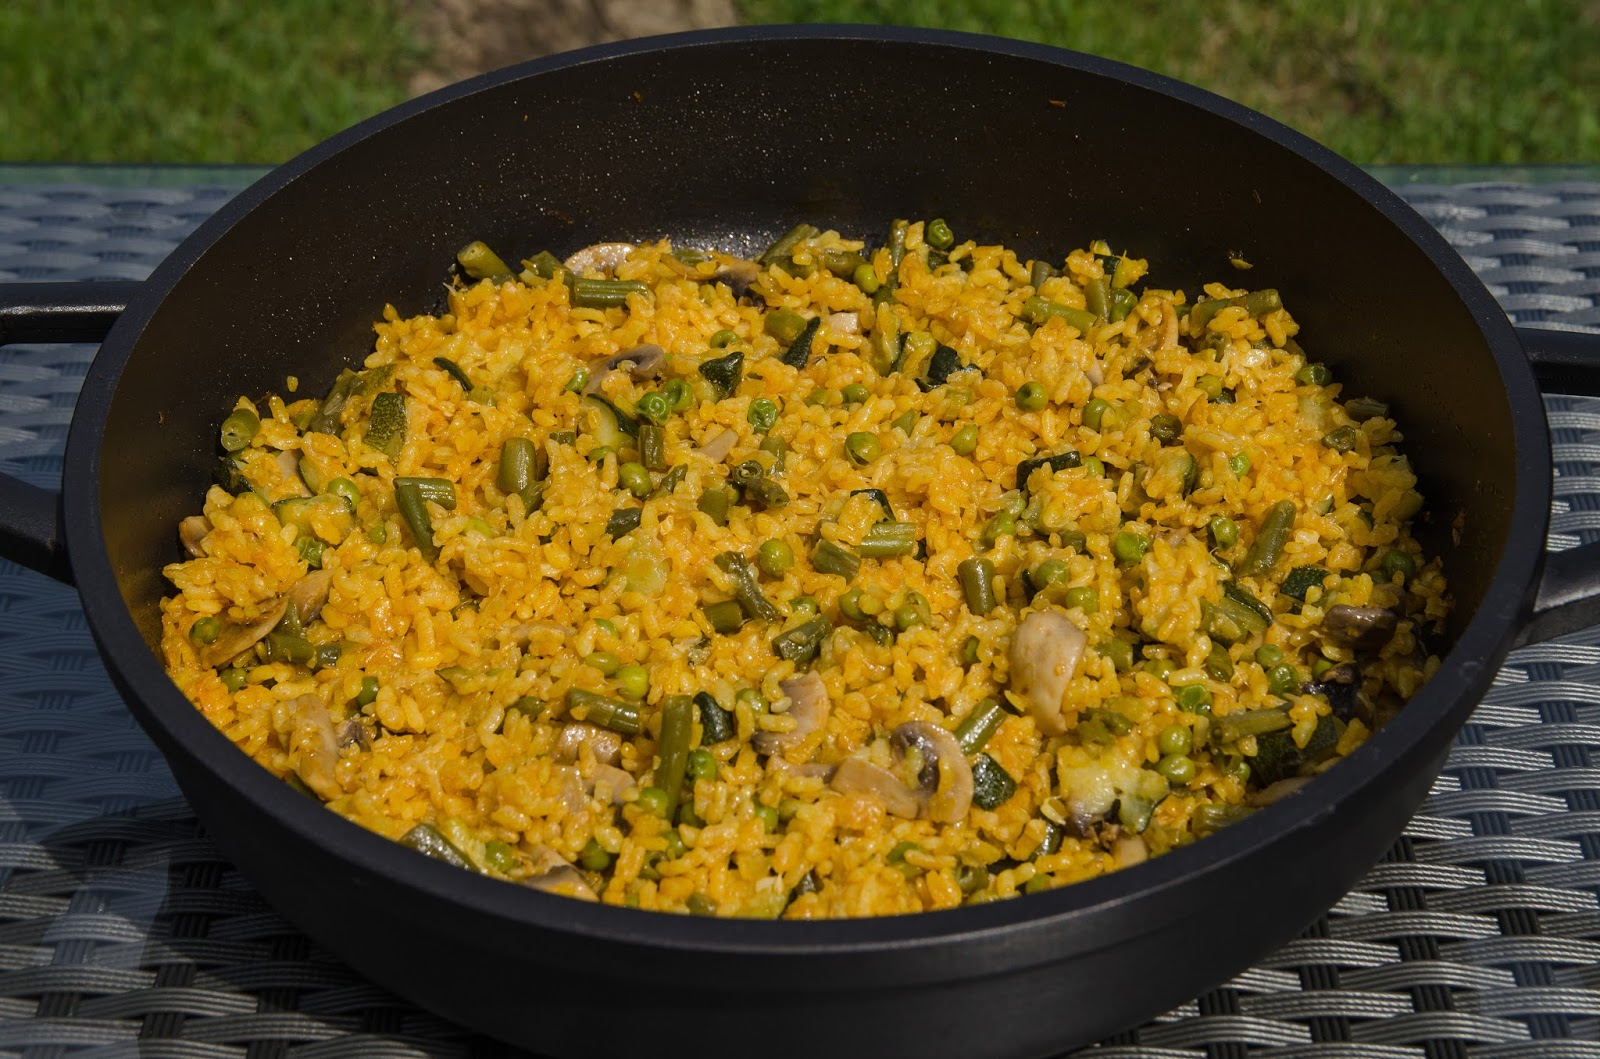 como-hacer-arroz-verduras-horno-montaña-casero-receta-facil-sana-saludable-ligera-judias-guisantes-alcachofa-calabacin-champiñones-bruja